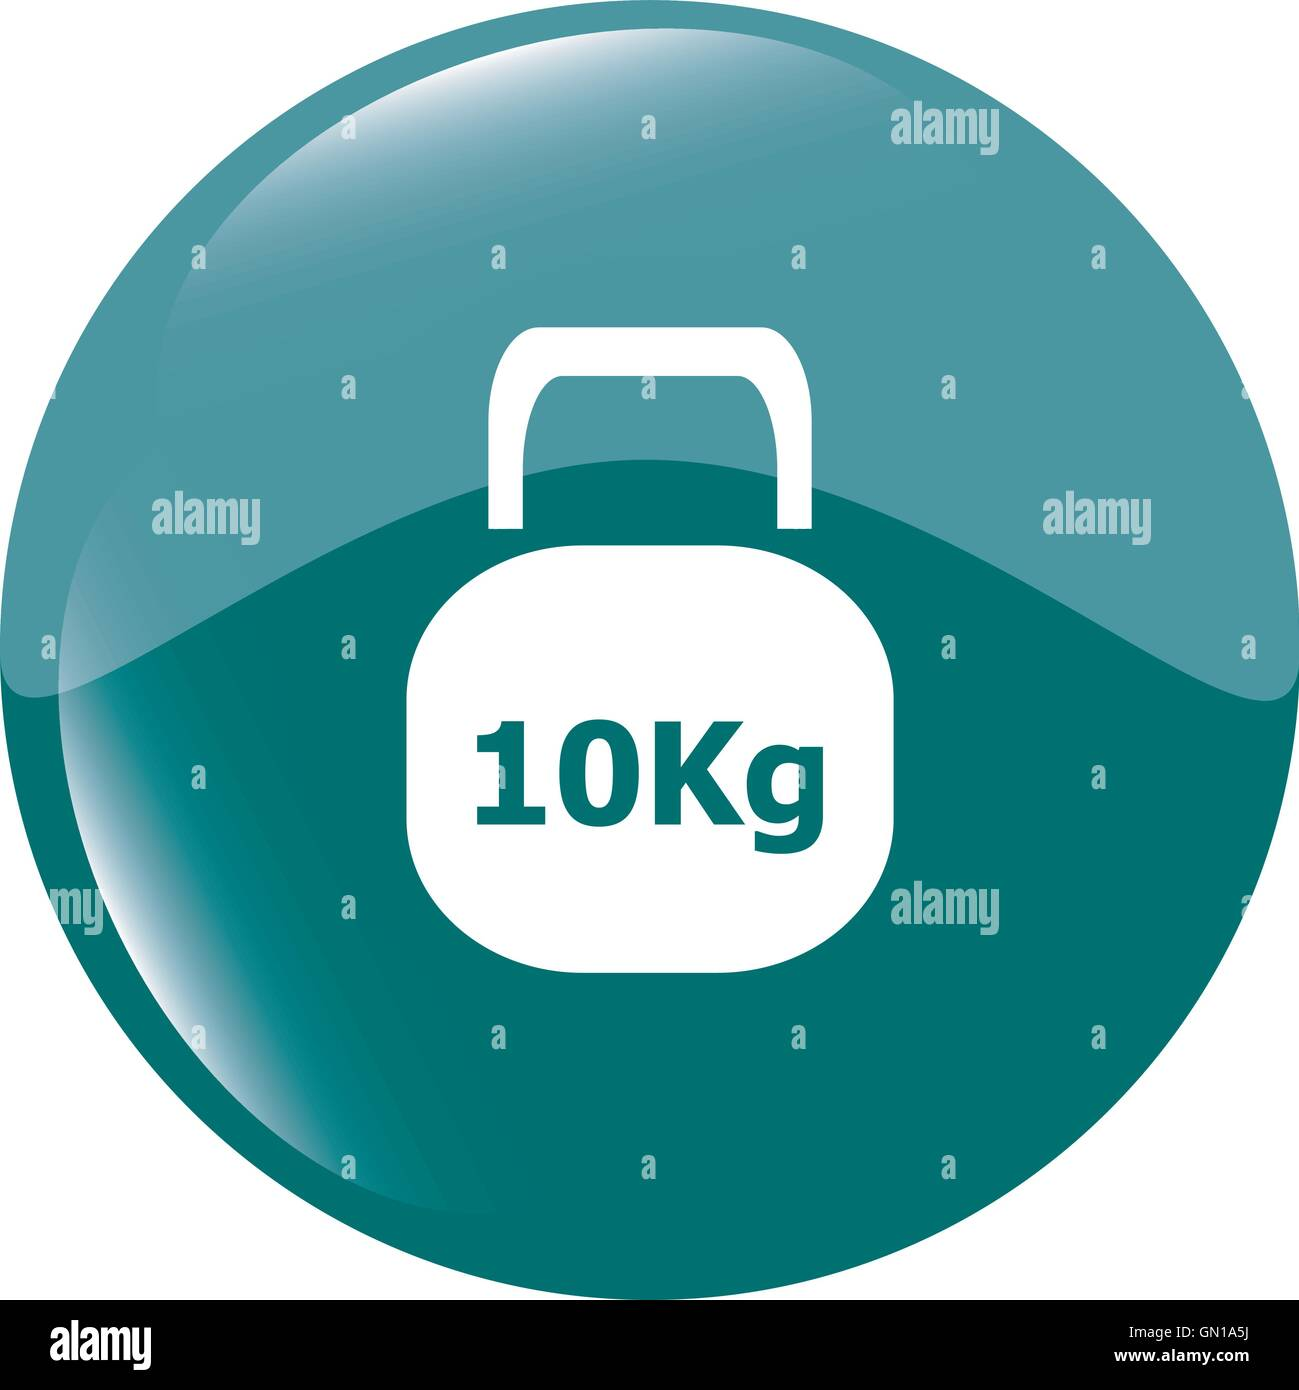 Weight sign icon. 10 kilogram (kg). Sport symbol. Fitness vector illustration - Stock Image